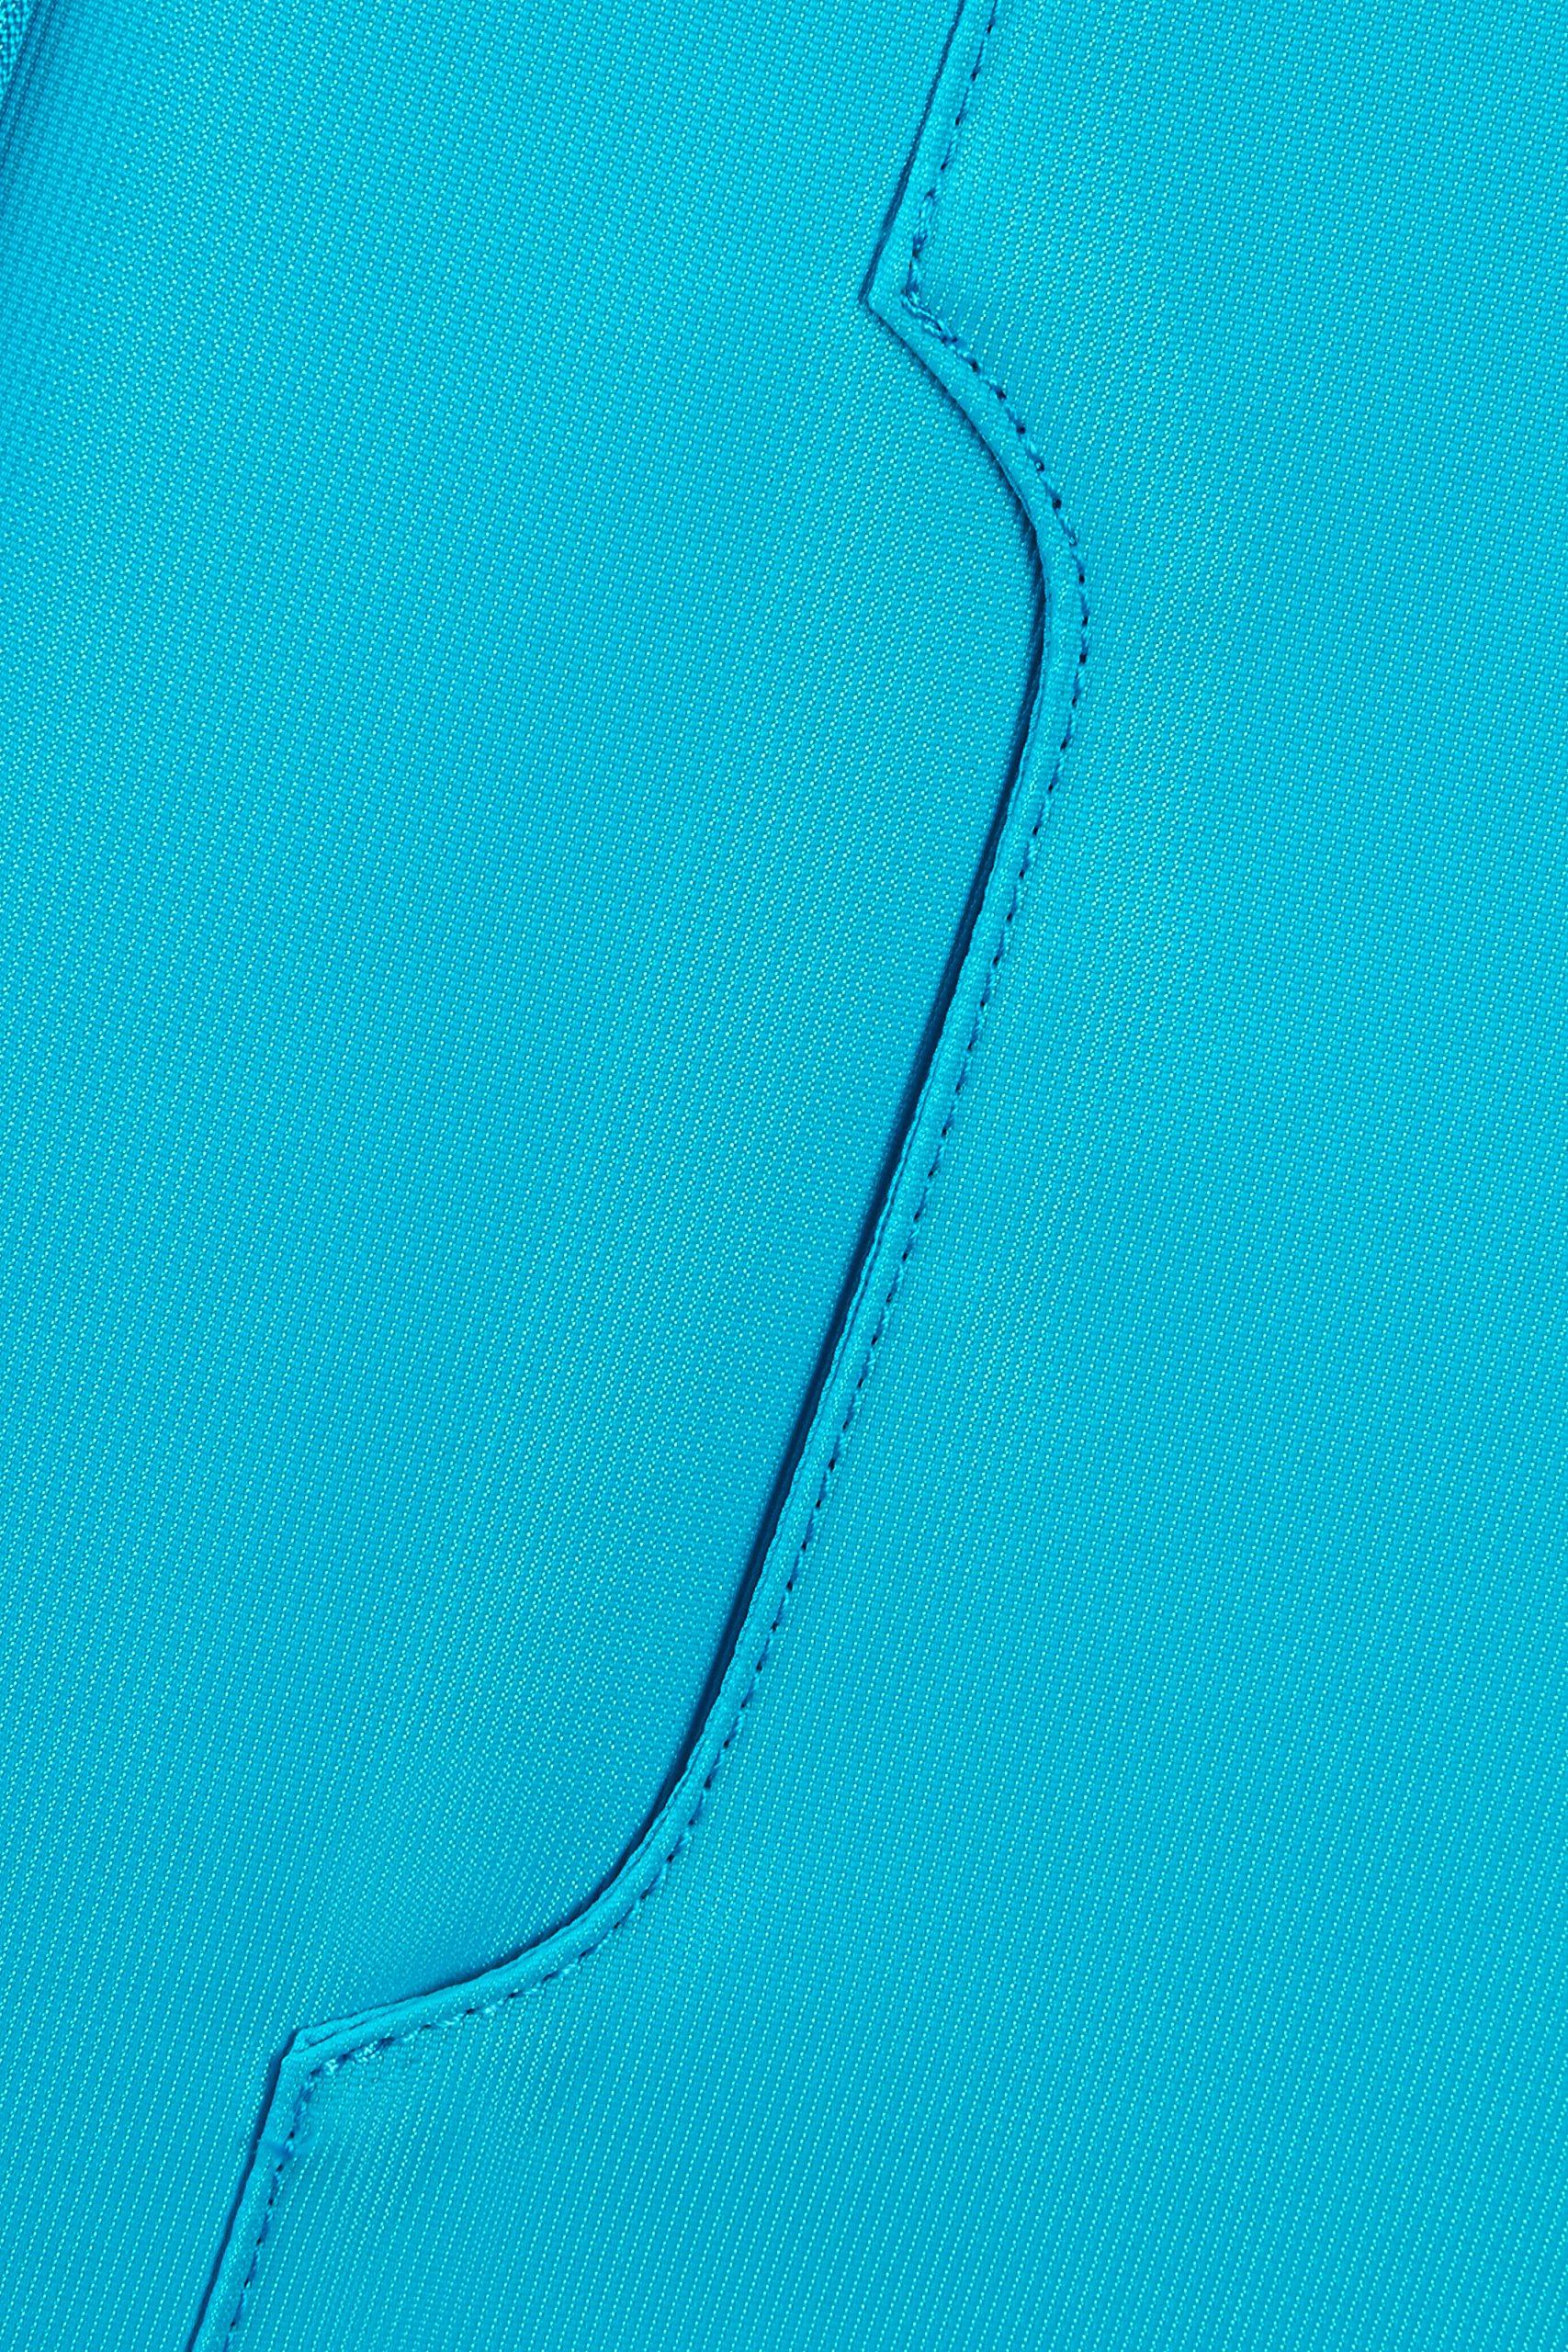 A1eimNXW4bL - American Tourister Herolite Maleta, Azul (MIDNIGHT BLUE), S EXP (55cm-42L)